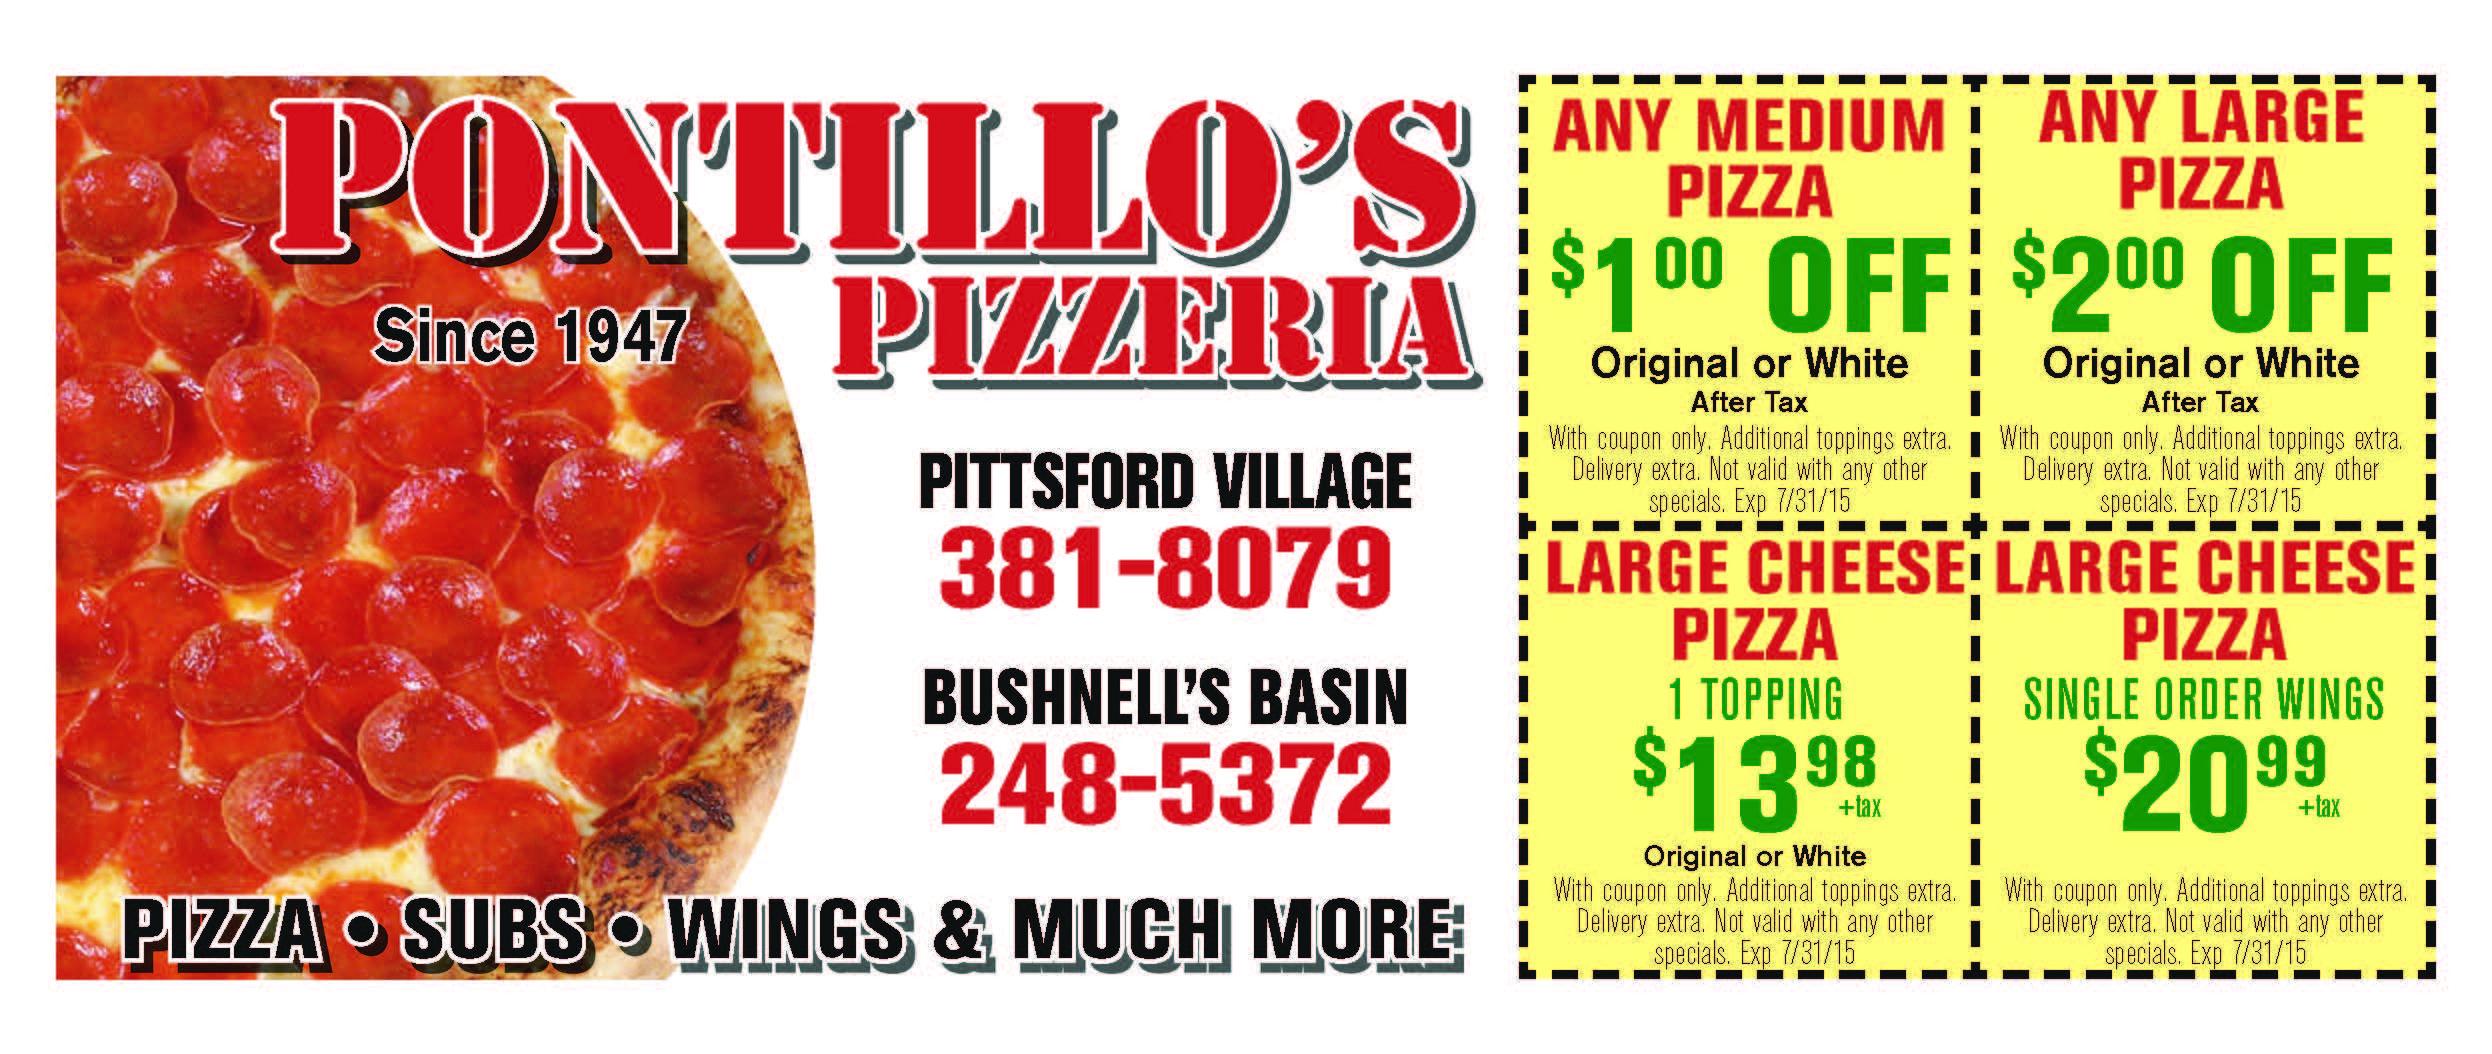 Combo #1 Medium 1-Topping Pizza + 10 PC Wings $25 @ Salvatore's Pizzeria